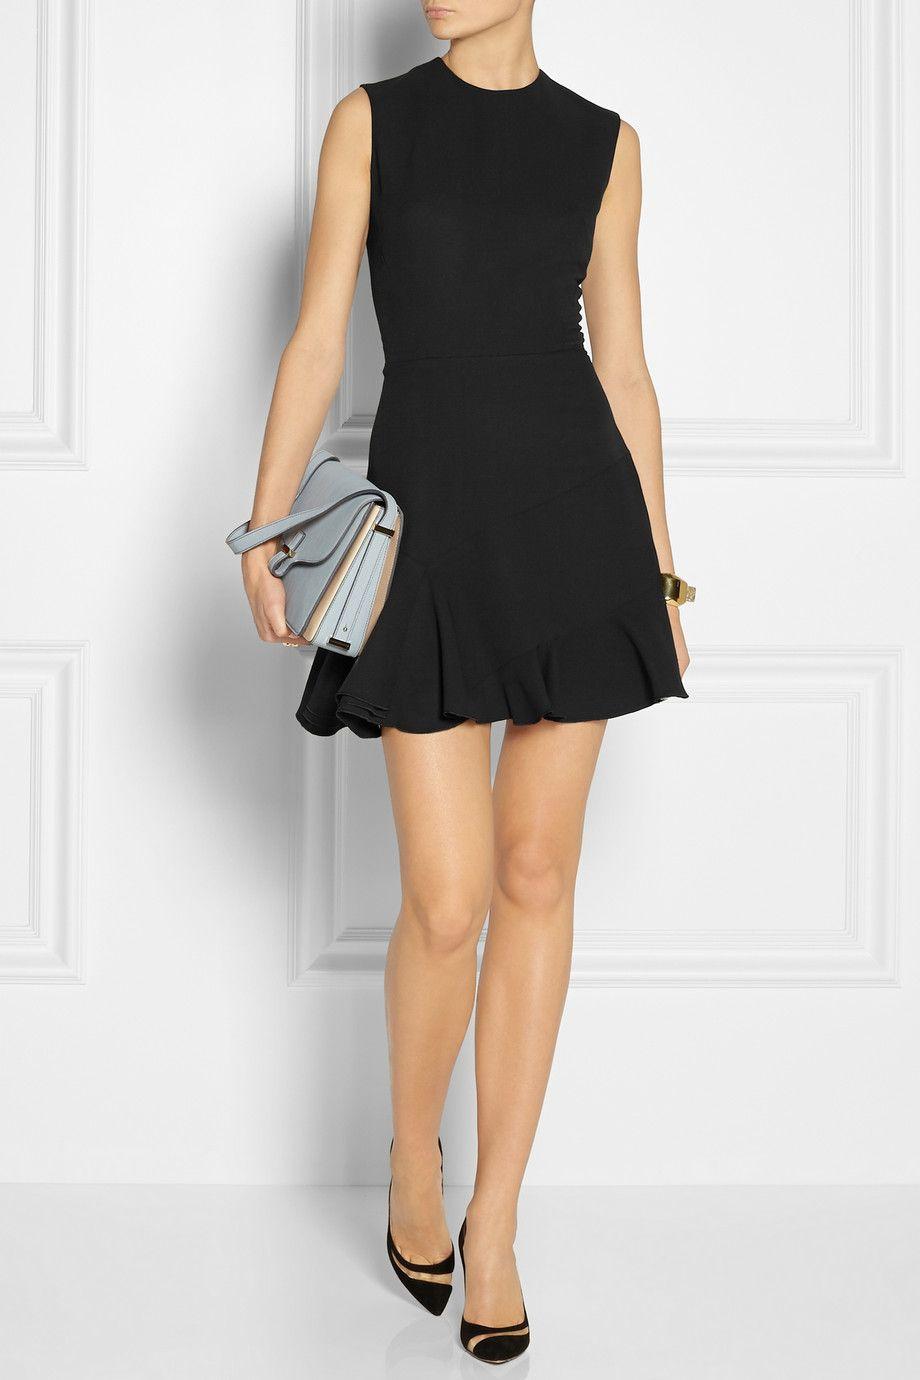 Victoria Beckham Silk Wool Blend Crepe Dress Dresses Fashion Little Black Dress [ 1380 x 920 Pixel ]